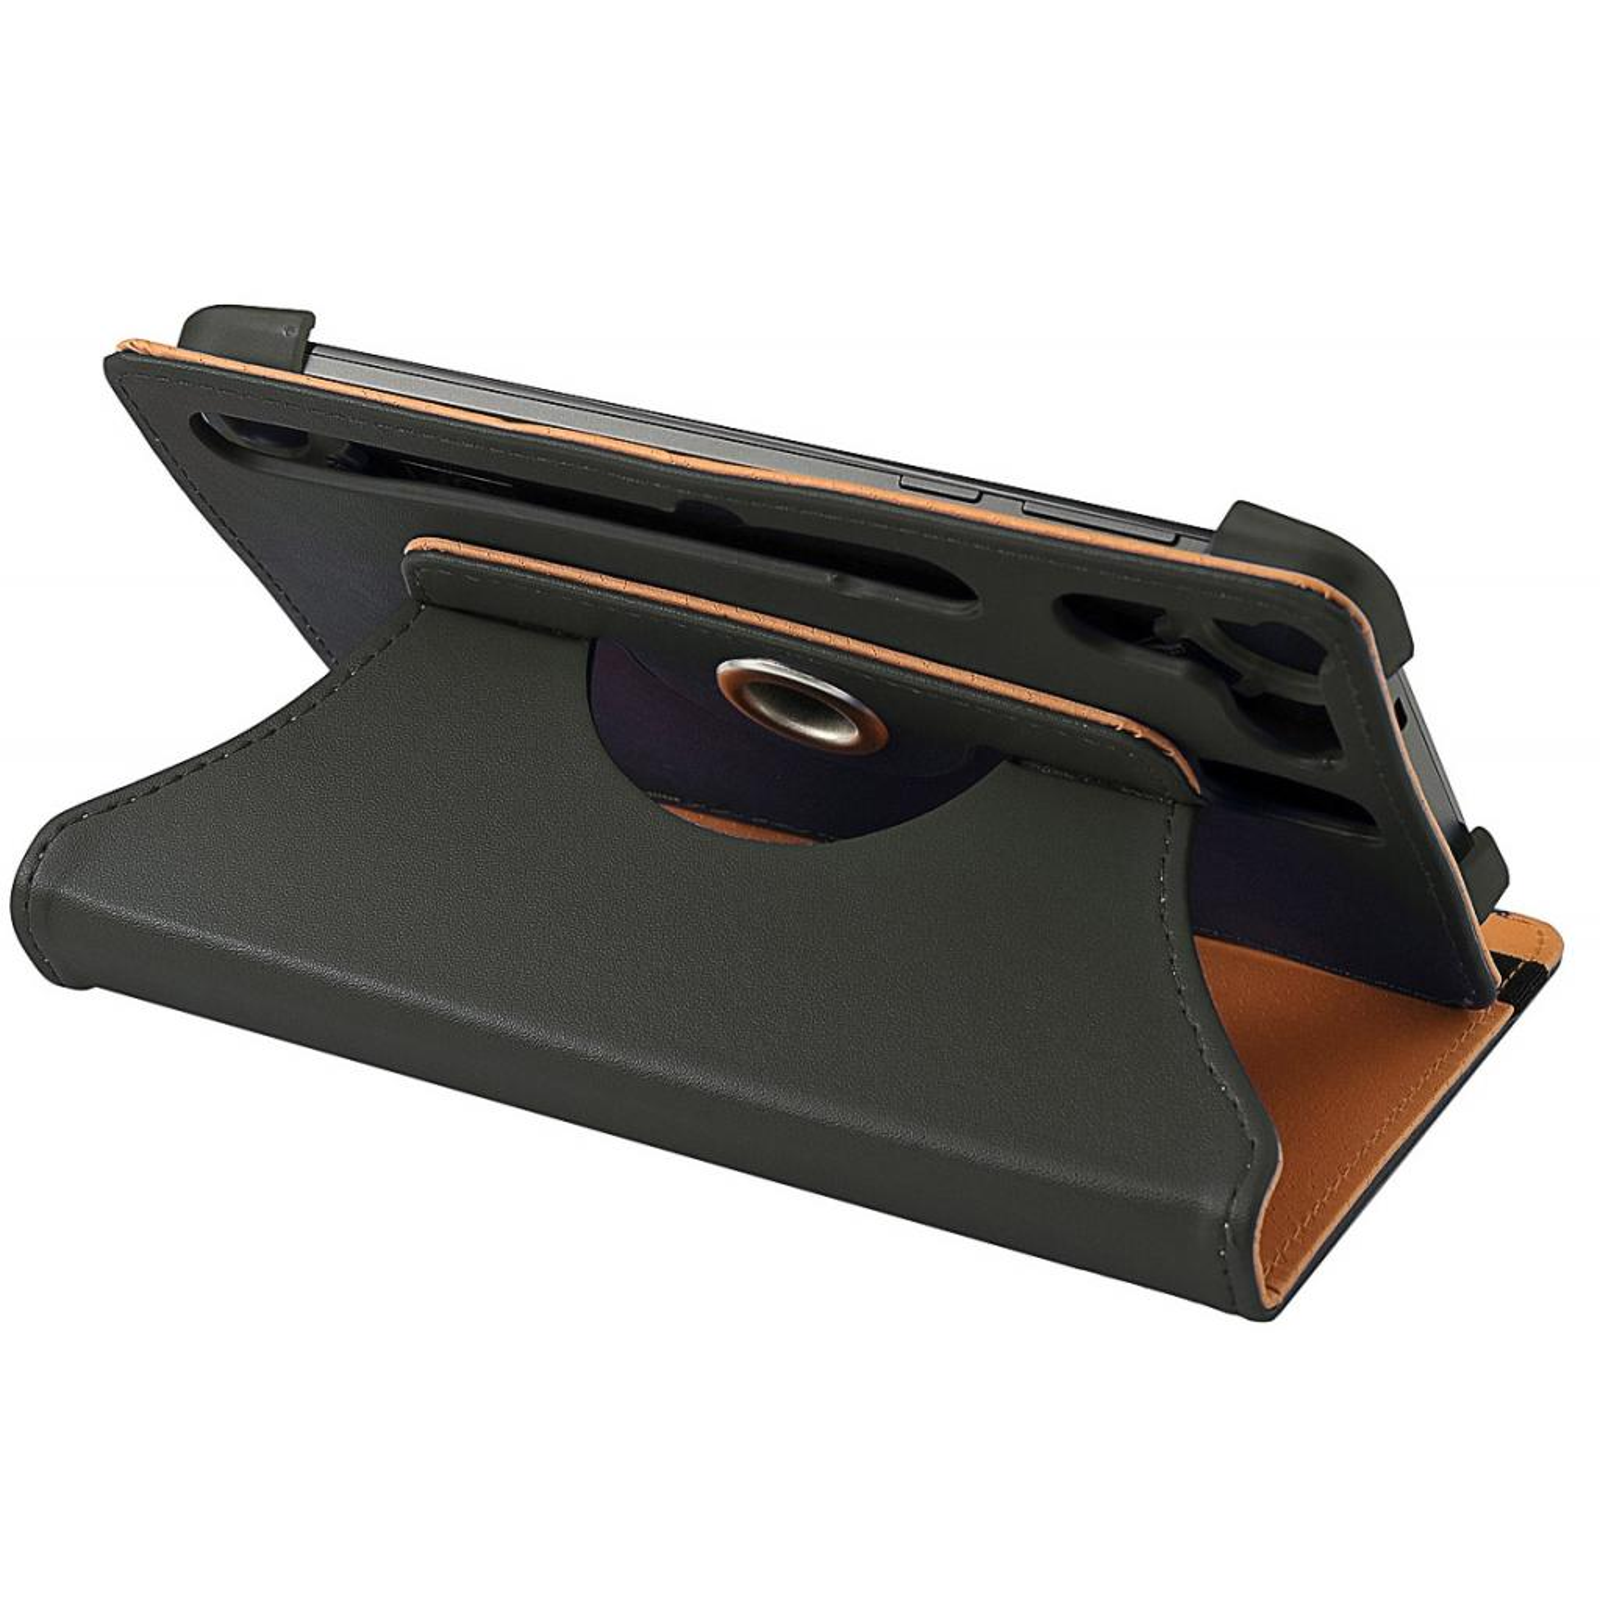 "Чехол для планшета Grand-X universal 7"" Grand-X TC03 Black (UTC - GX7TC03B) изображение 5"